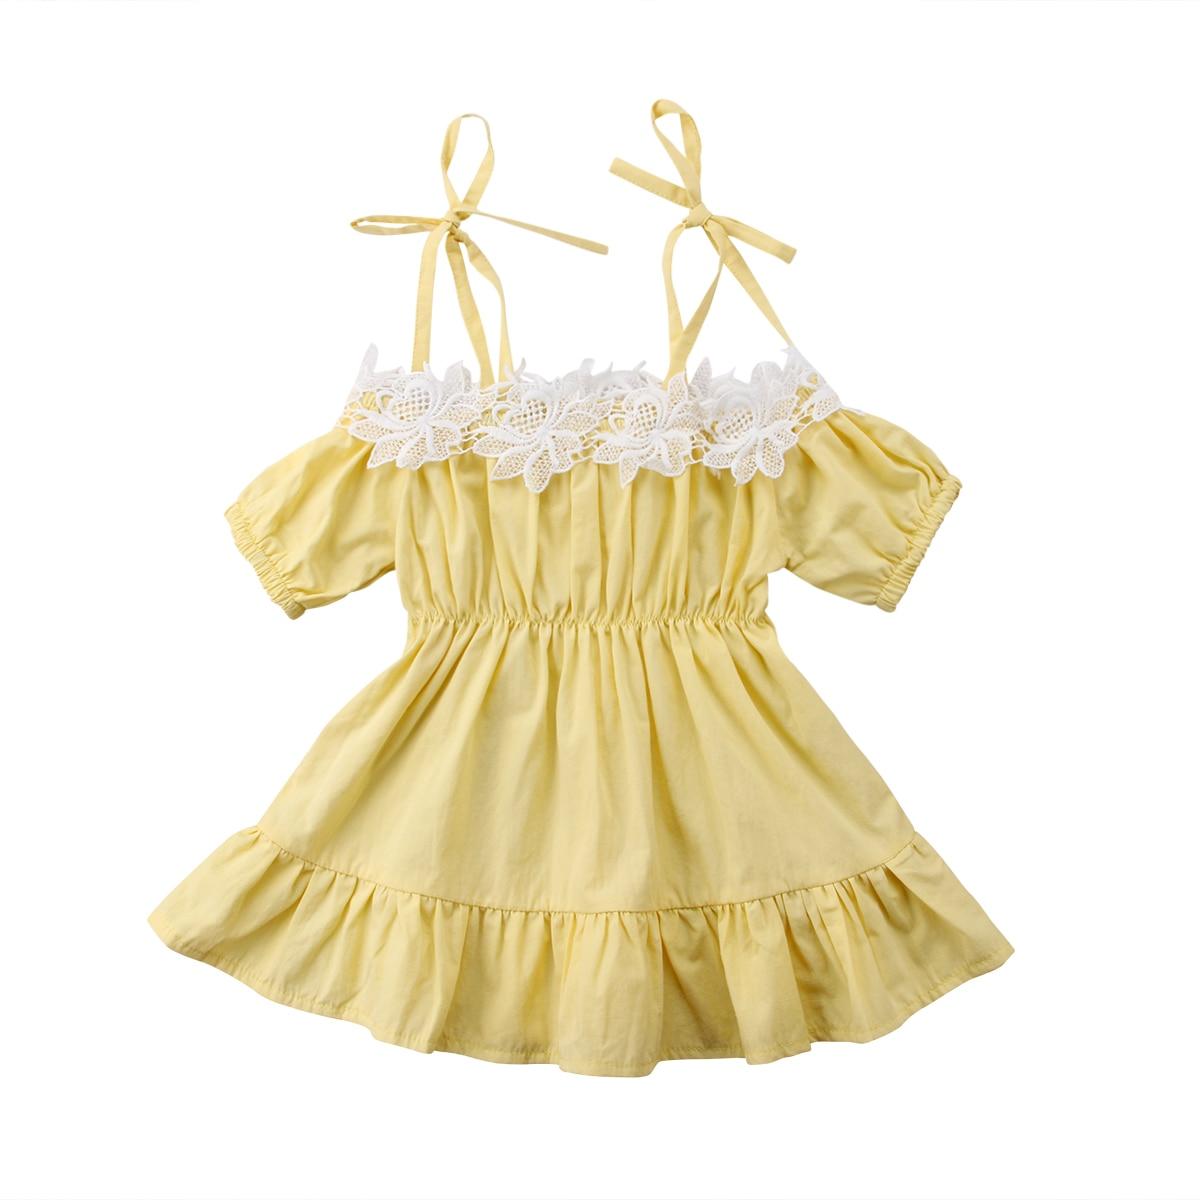 Kids Toddler Baby Girl Princess Dress Floral Pageant Wedding Party Tutu Dresses